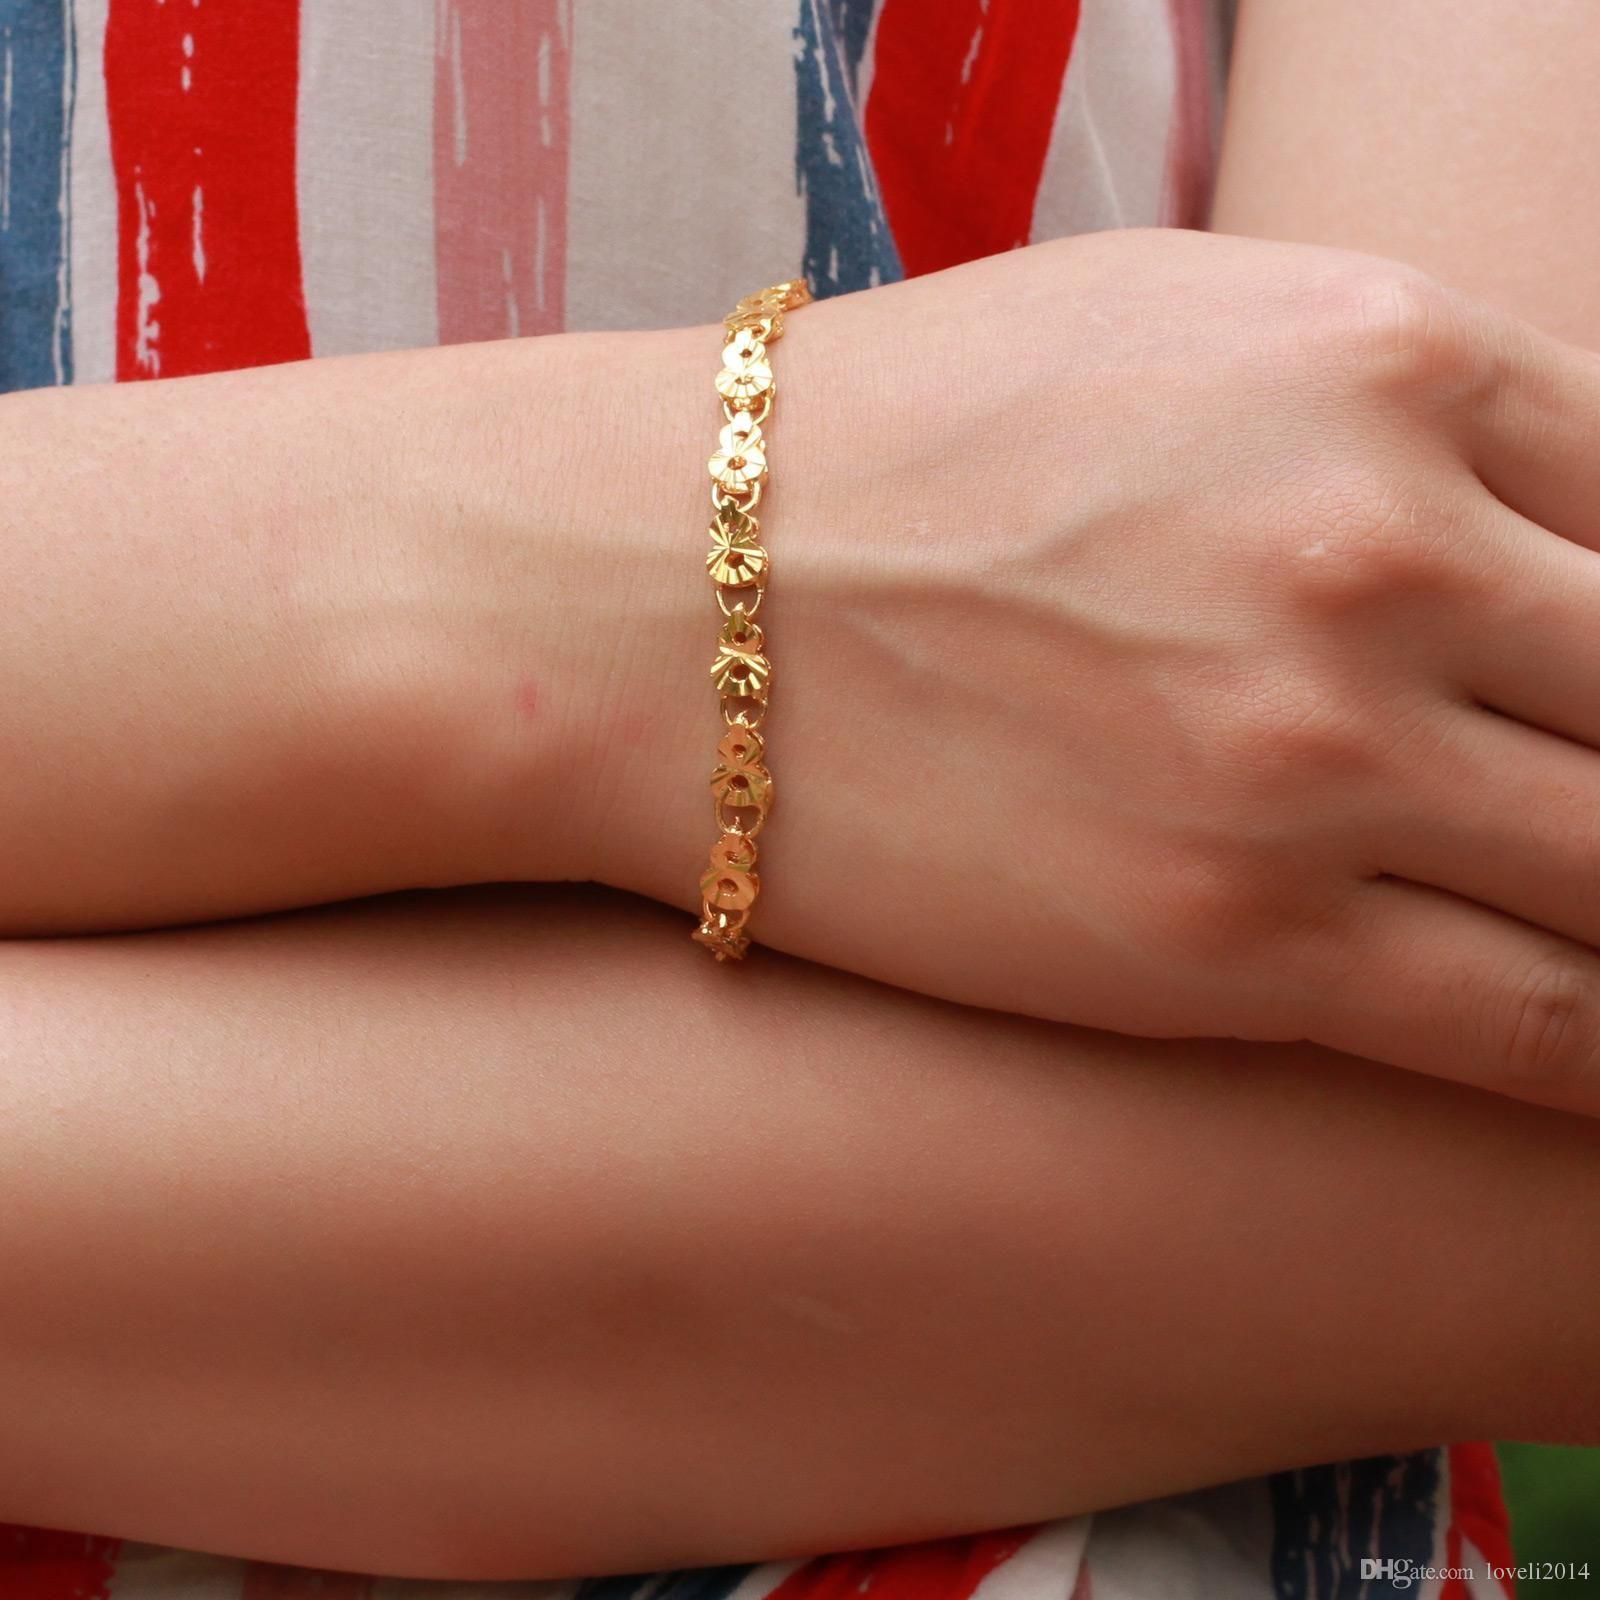 Snelle gratis verzending Fijne bruiloft sieraden 18K gouden armband, vrouwen armband breed 6 mm lengte 21.5cm